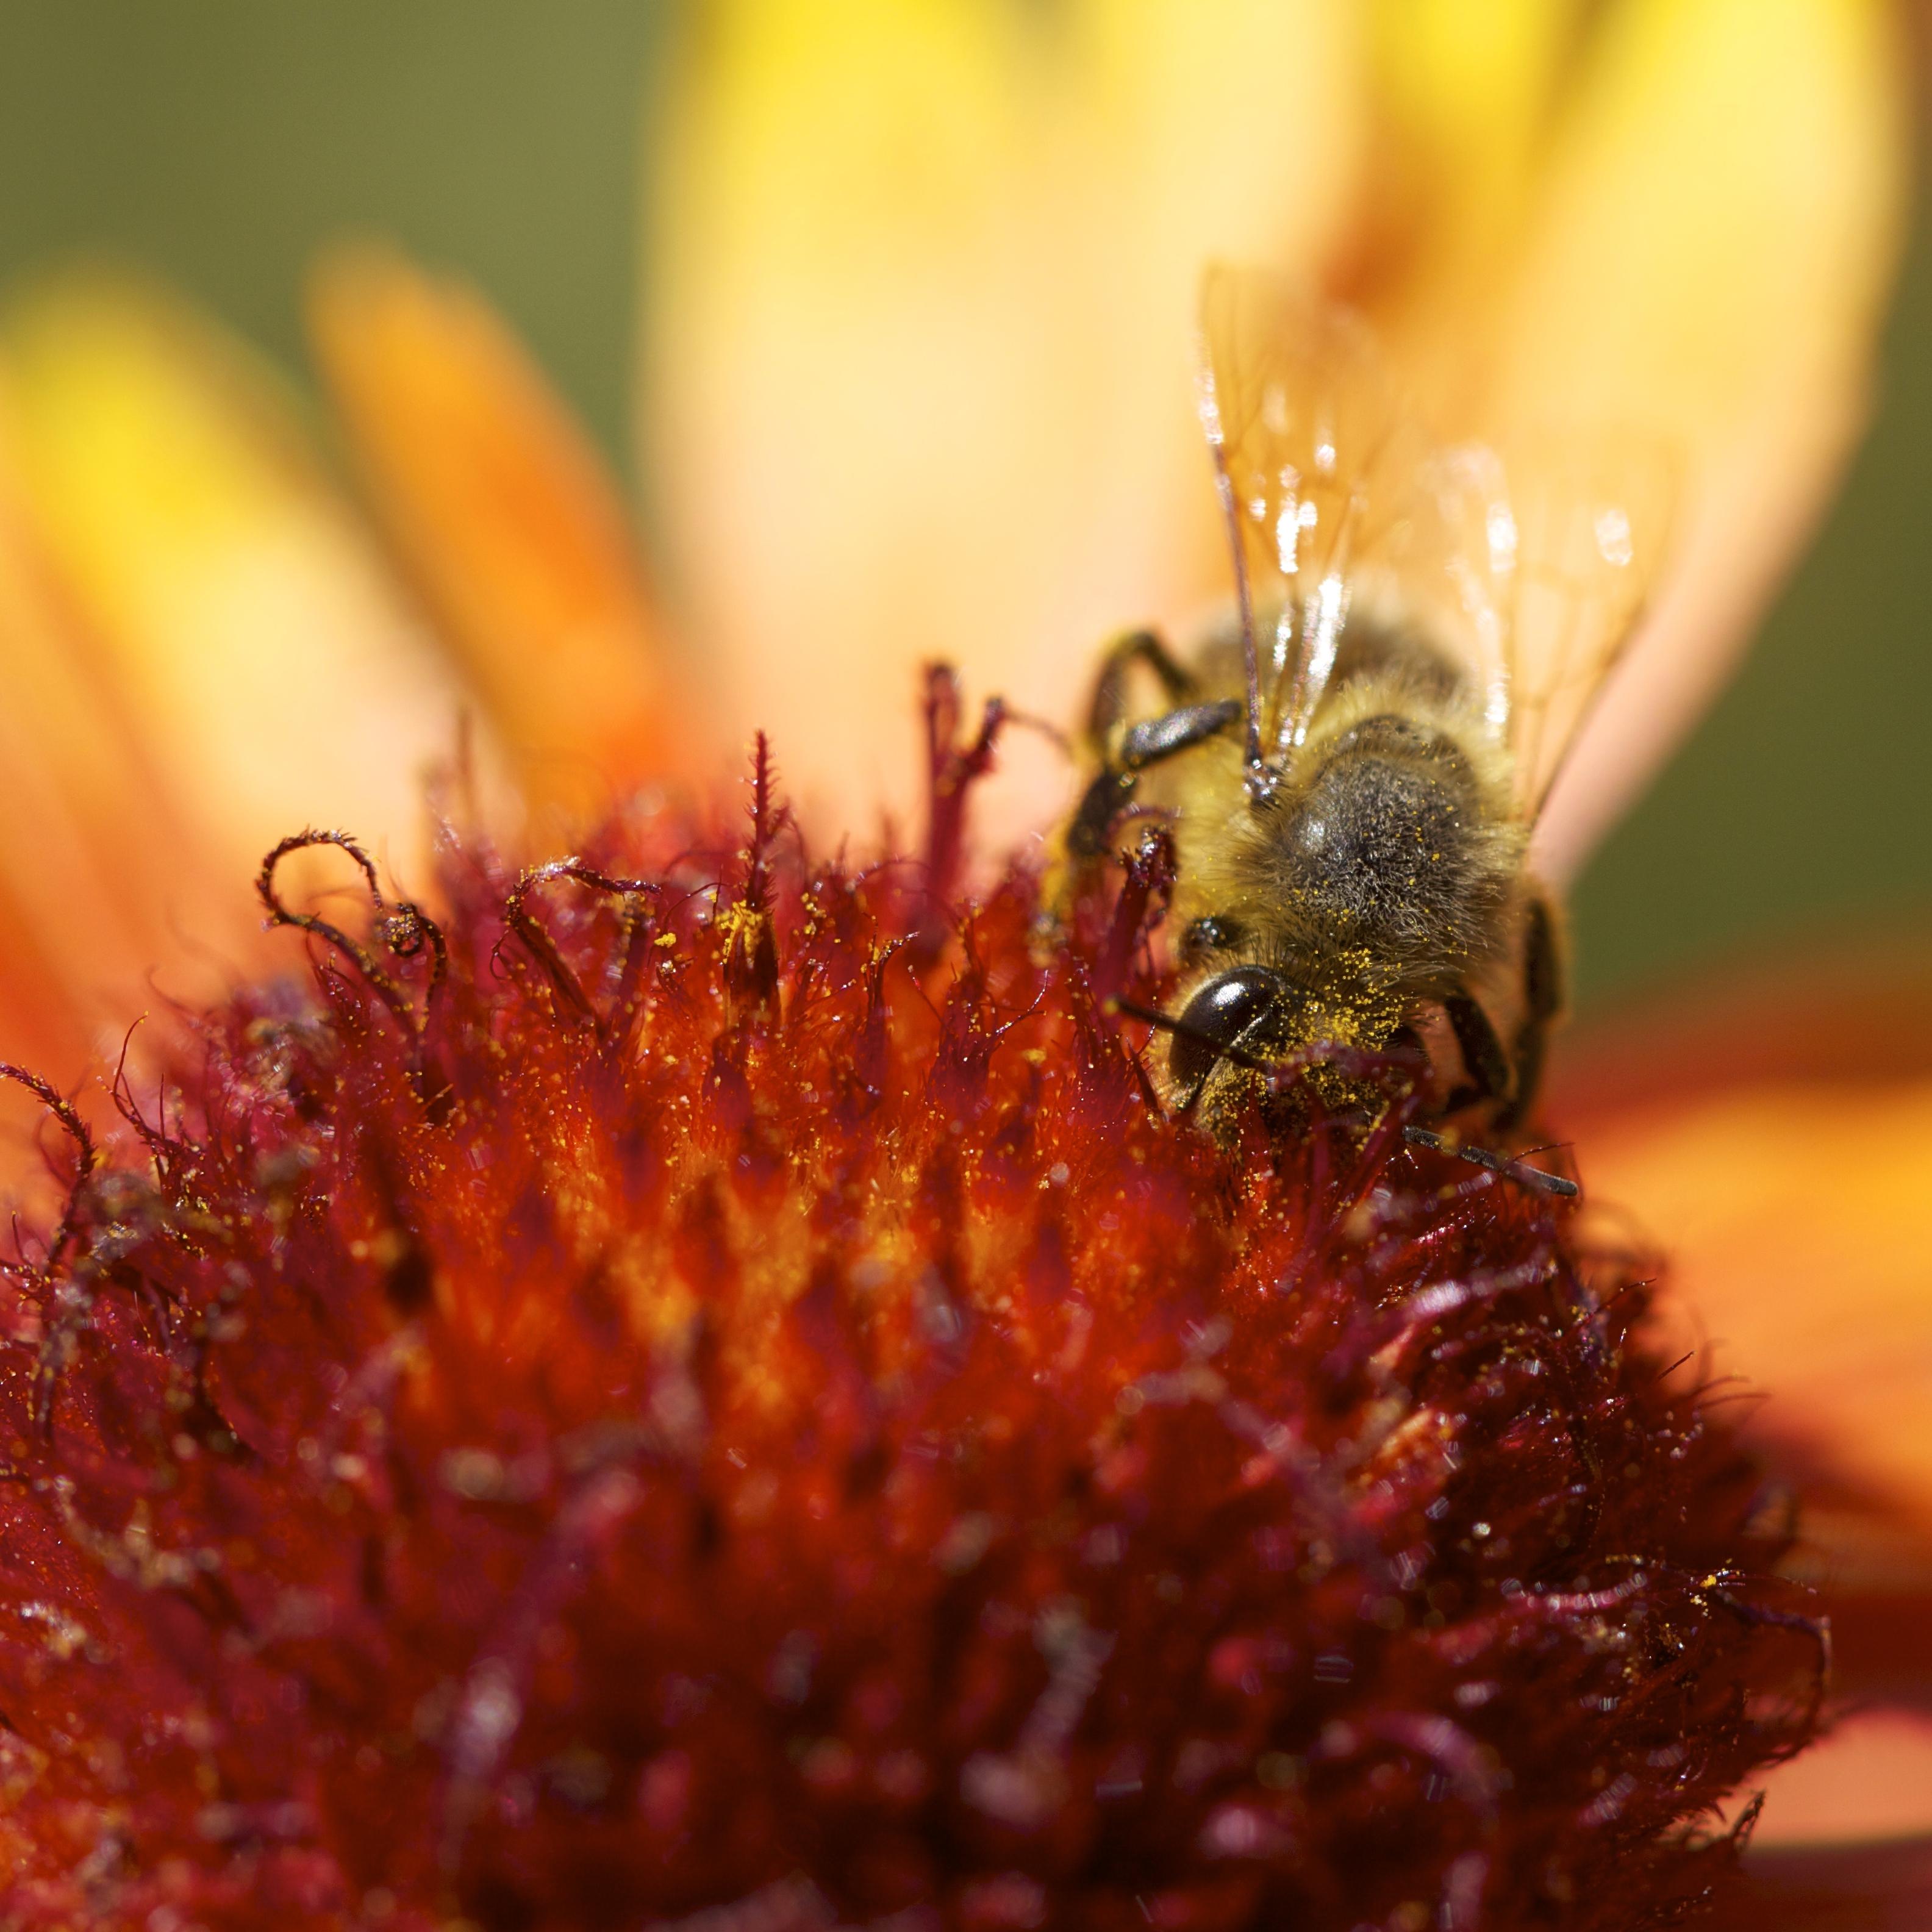 Honeybee face-deep in Gallardia.